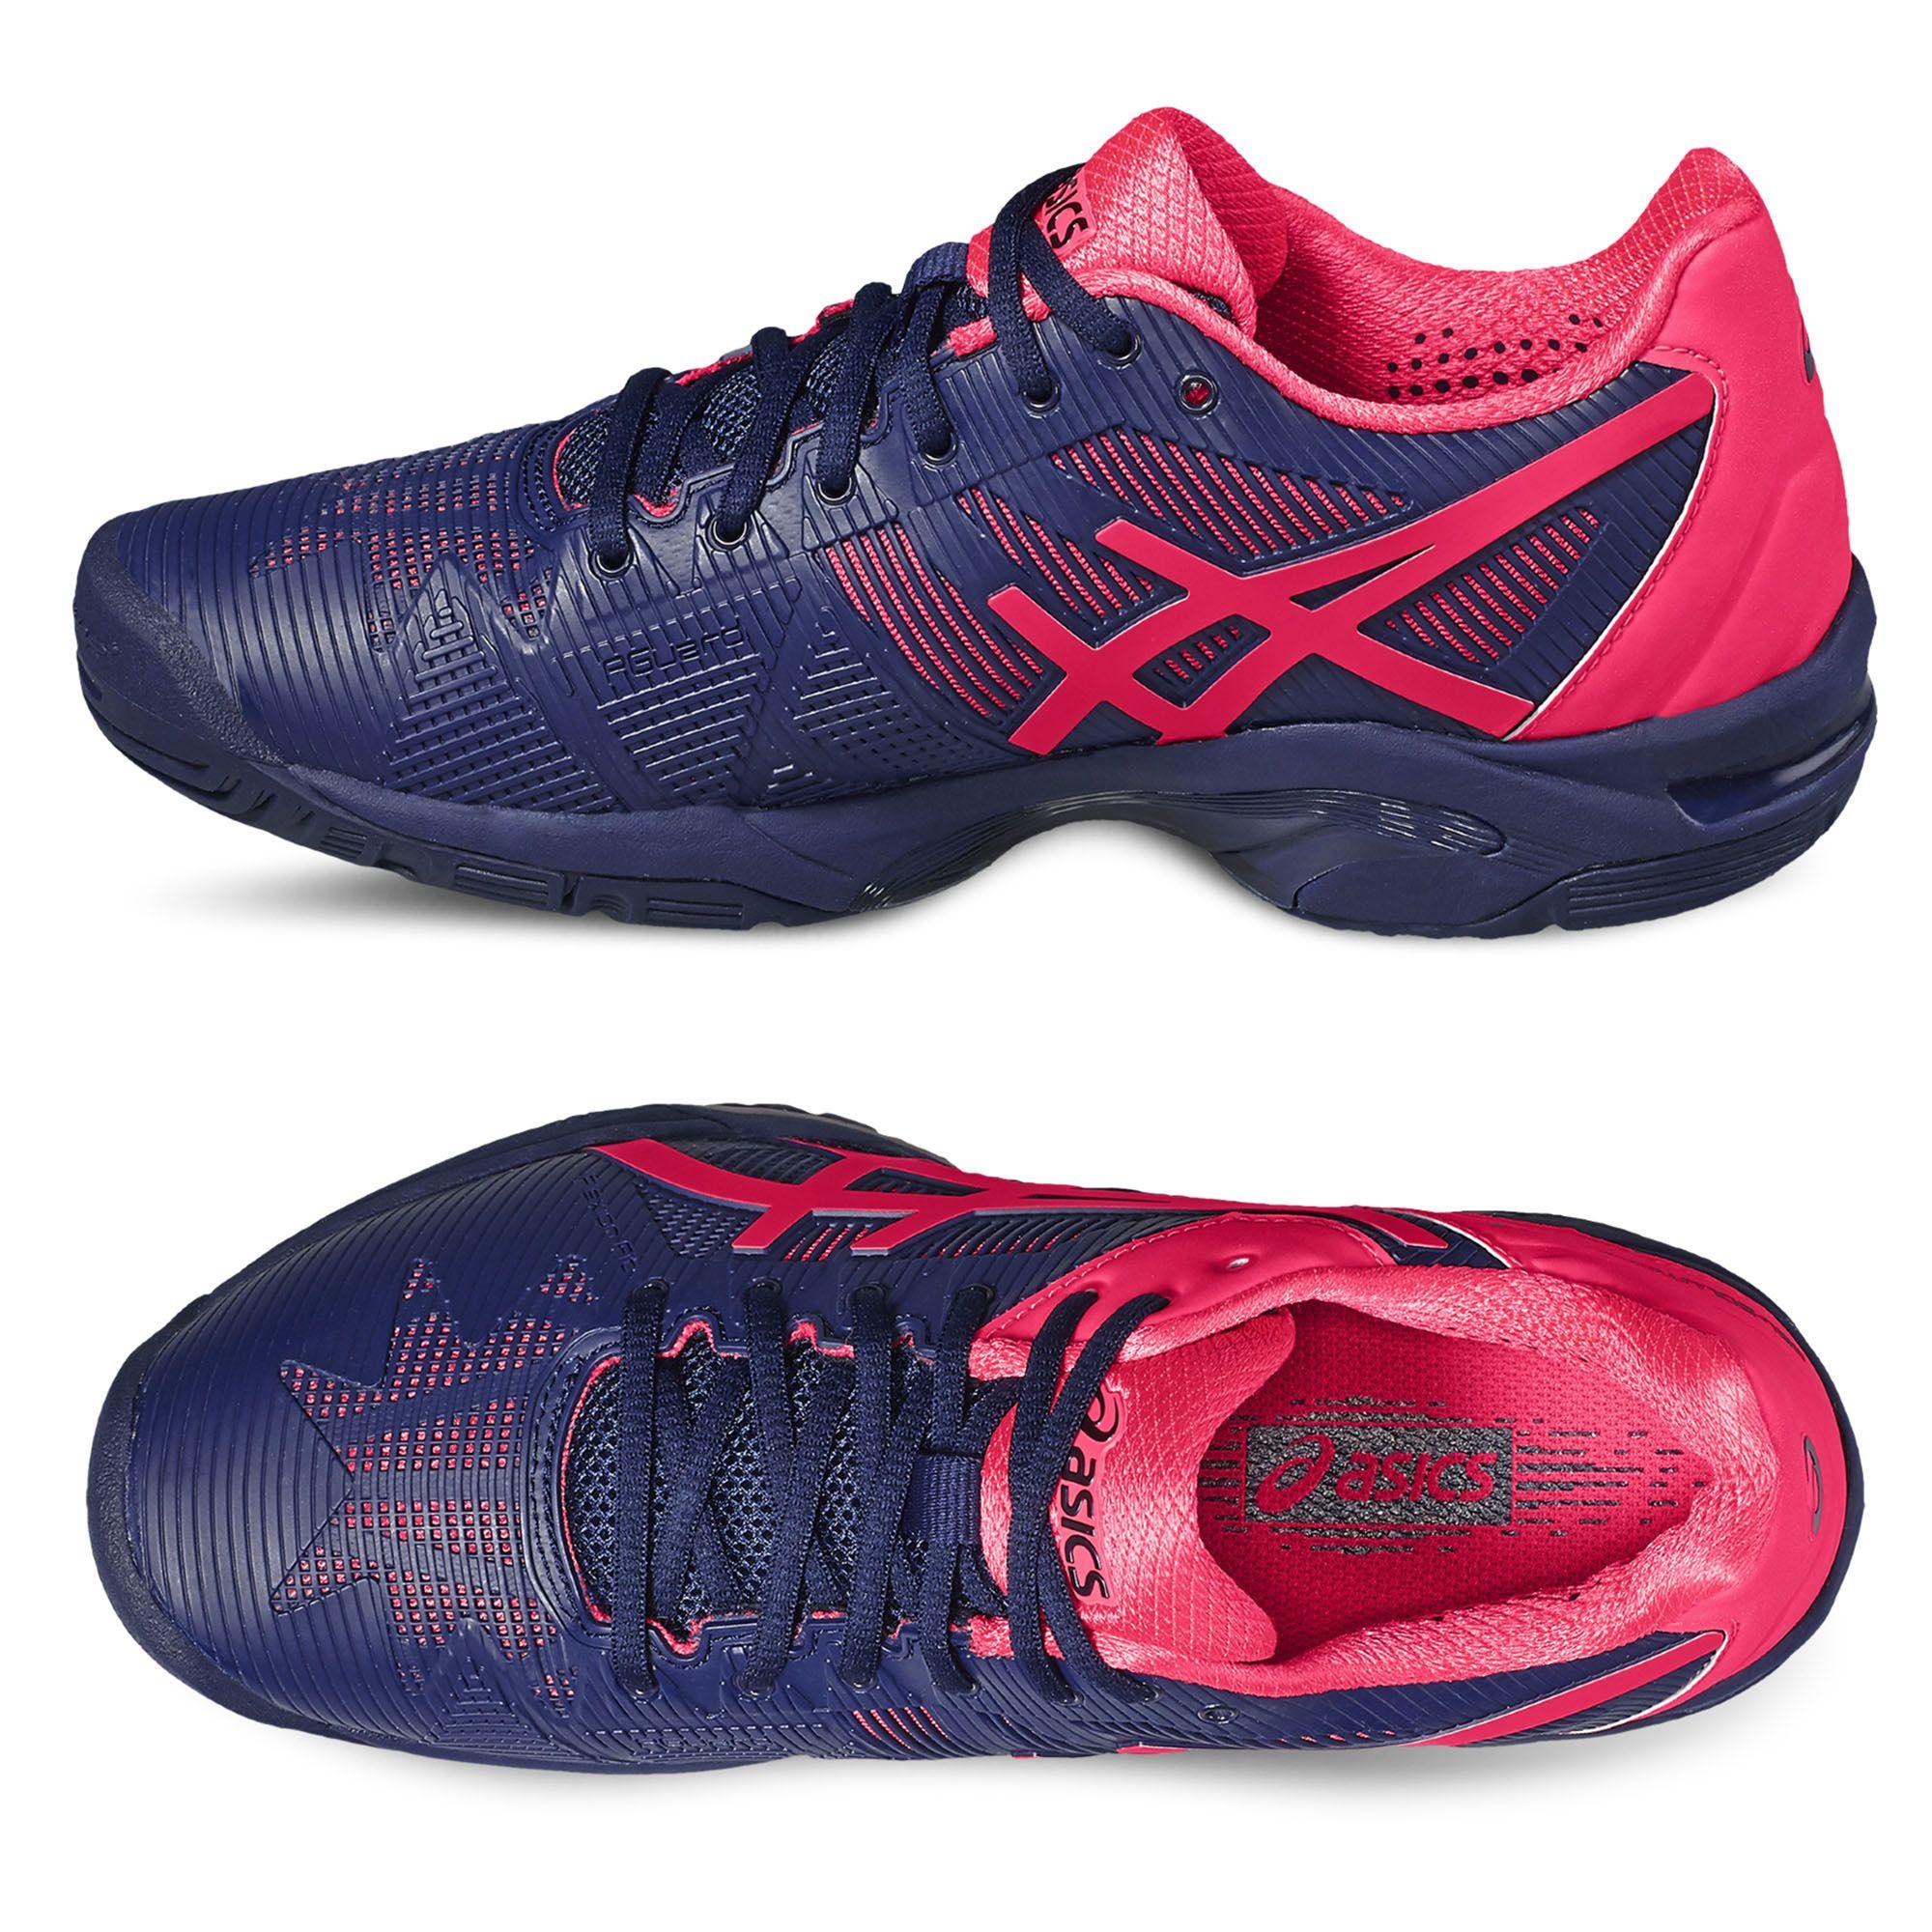 Asics Gel Solution Speed 3 Ladies Tennis Shoes